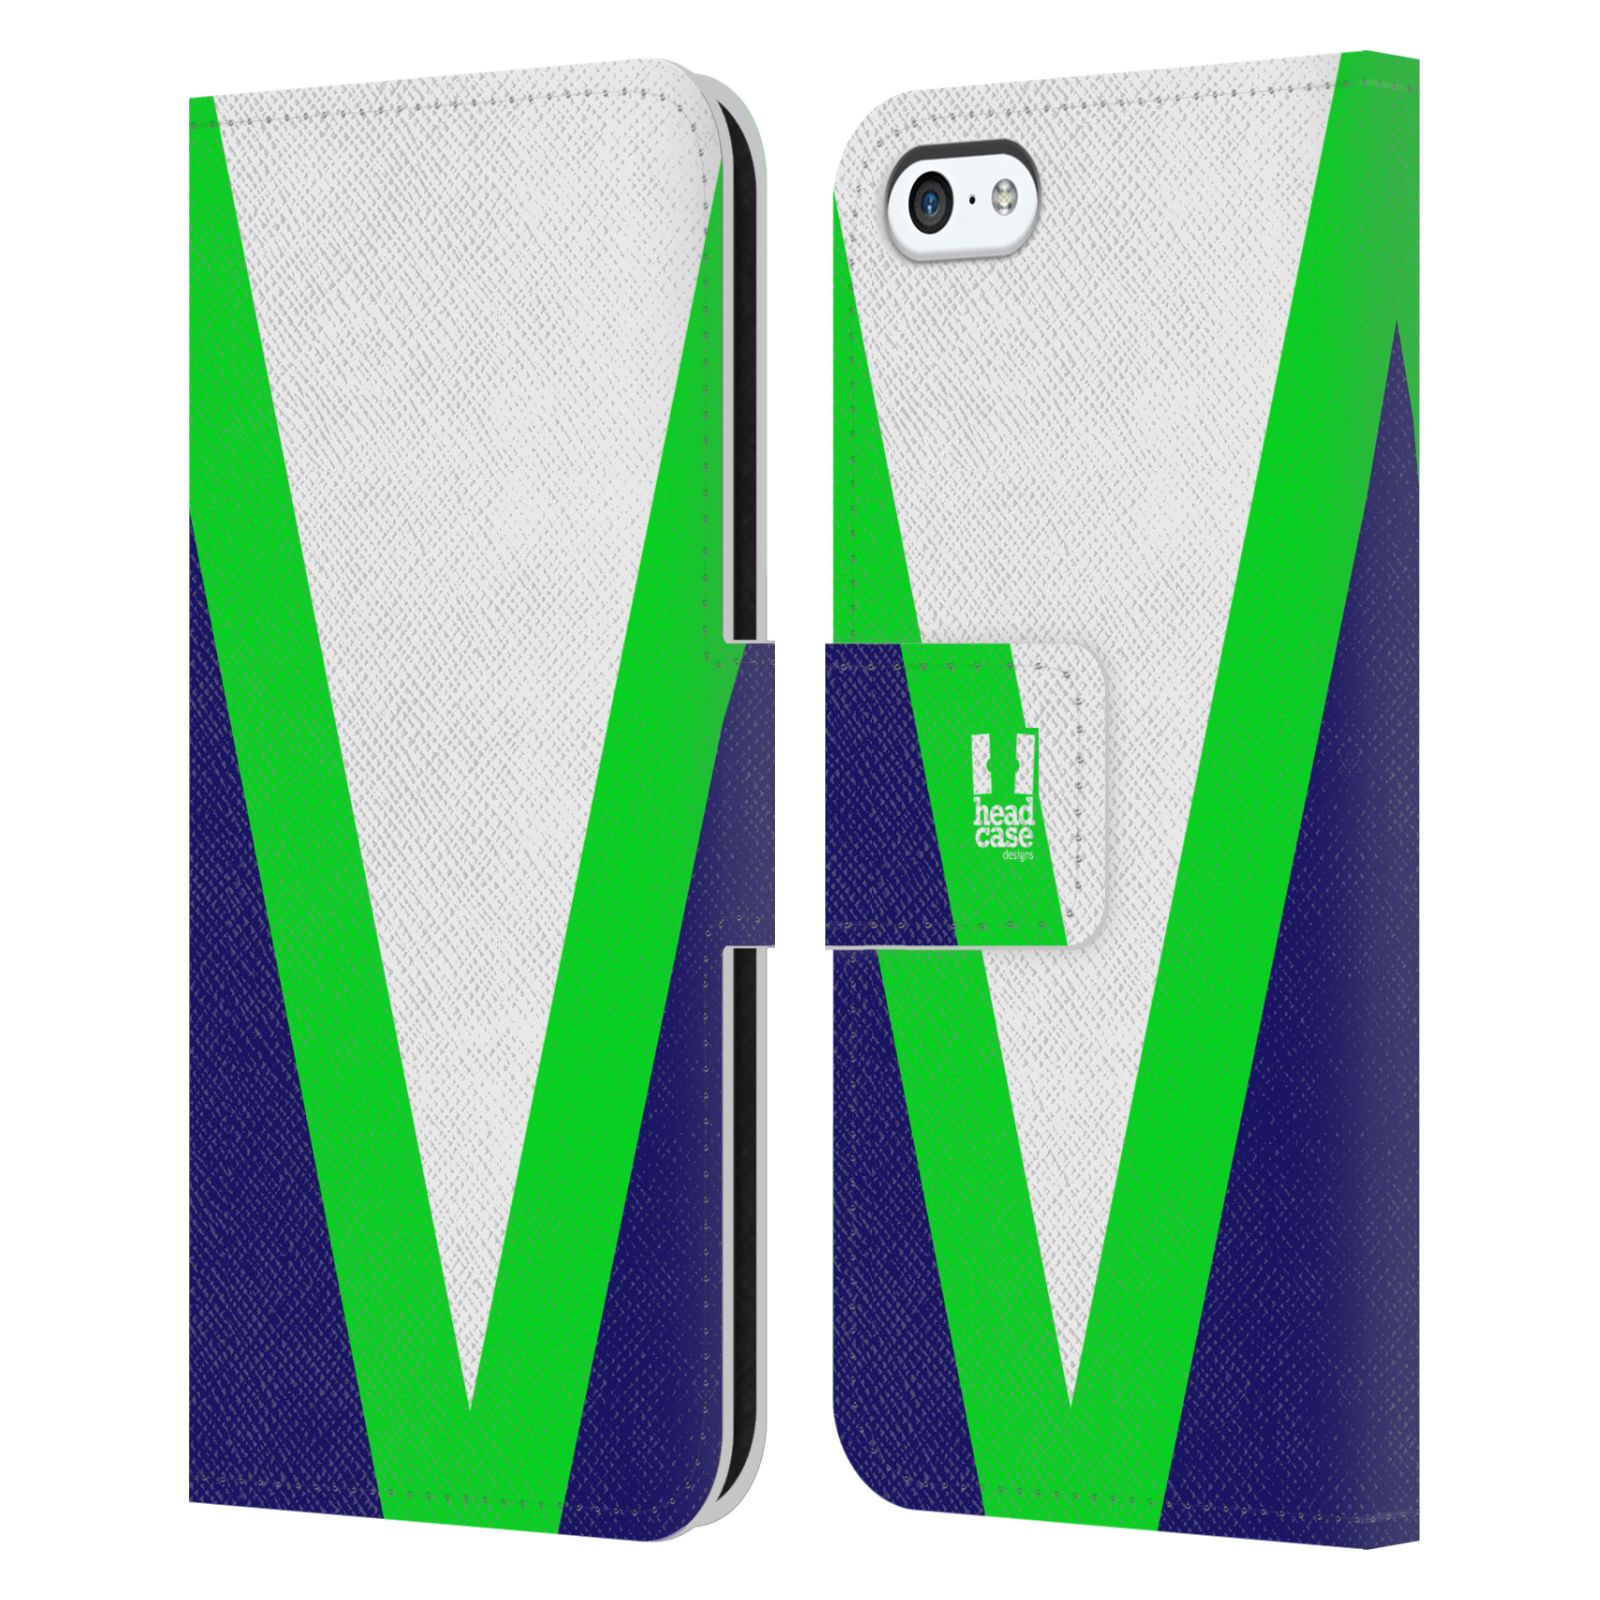 HEAD CASE Flipové pouzdro pro mobil Apple Iphone 5C barevné tvary zelená a modrá